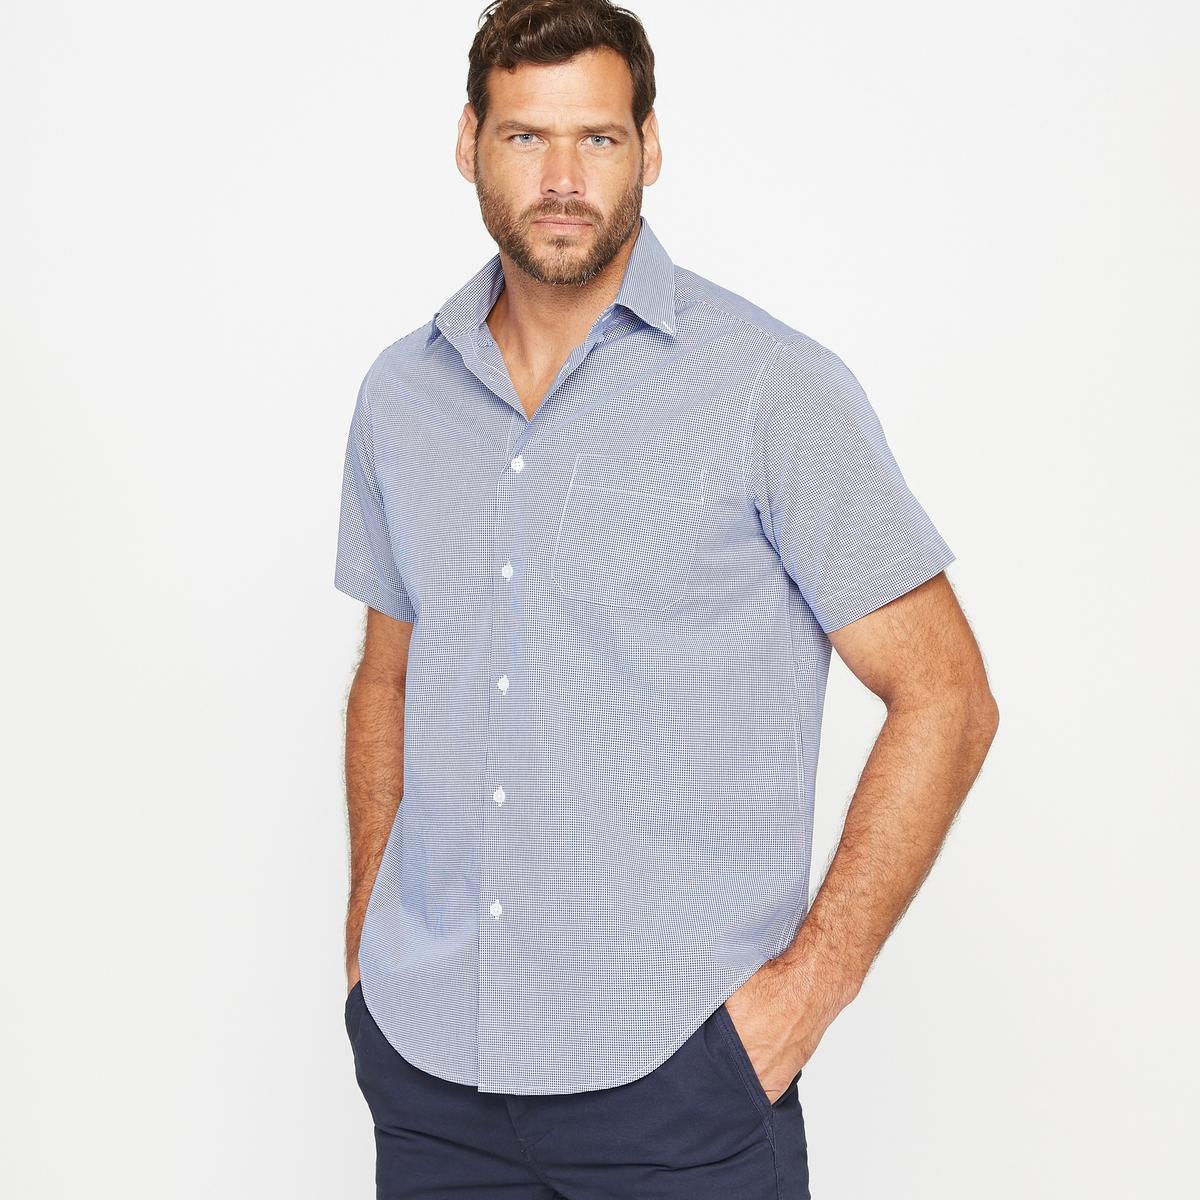 CASTALUNA FOR MEN Рубашка, рост 1 и 2 (до 187 см)